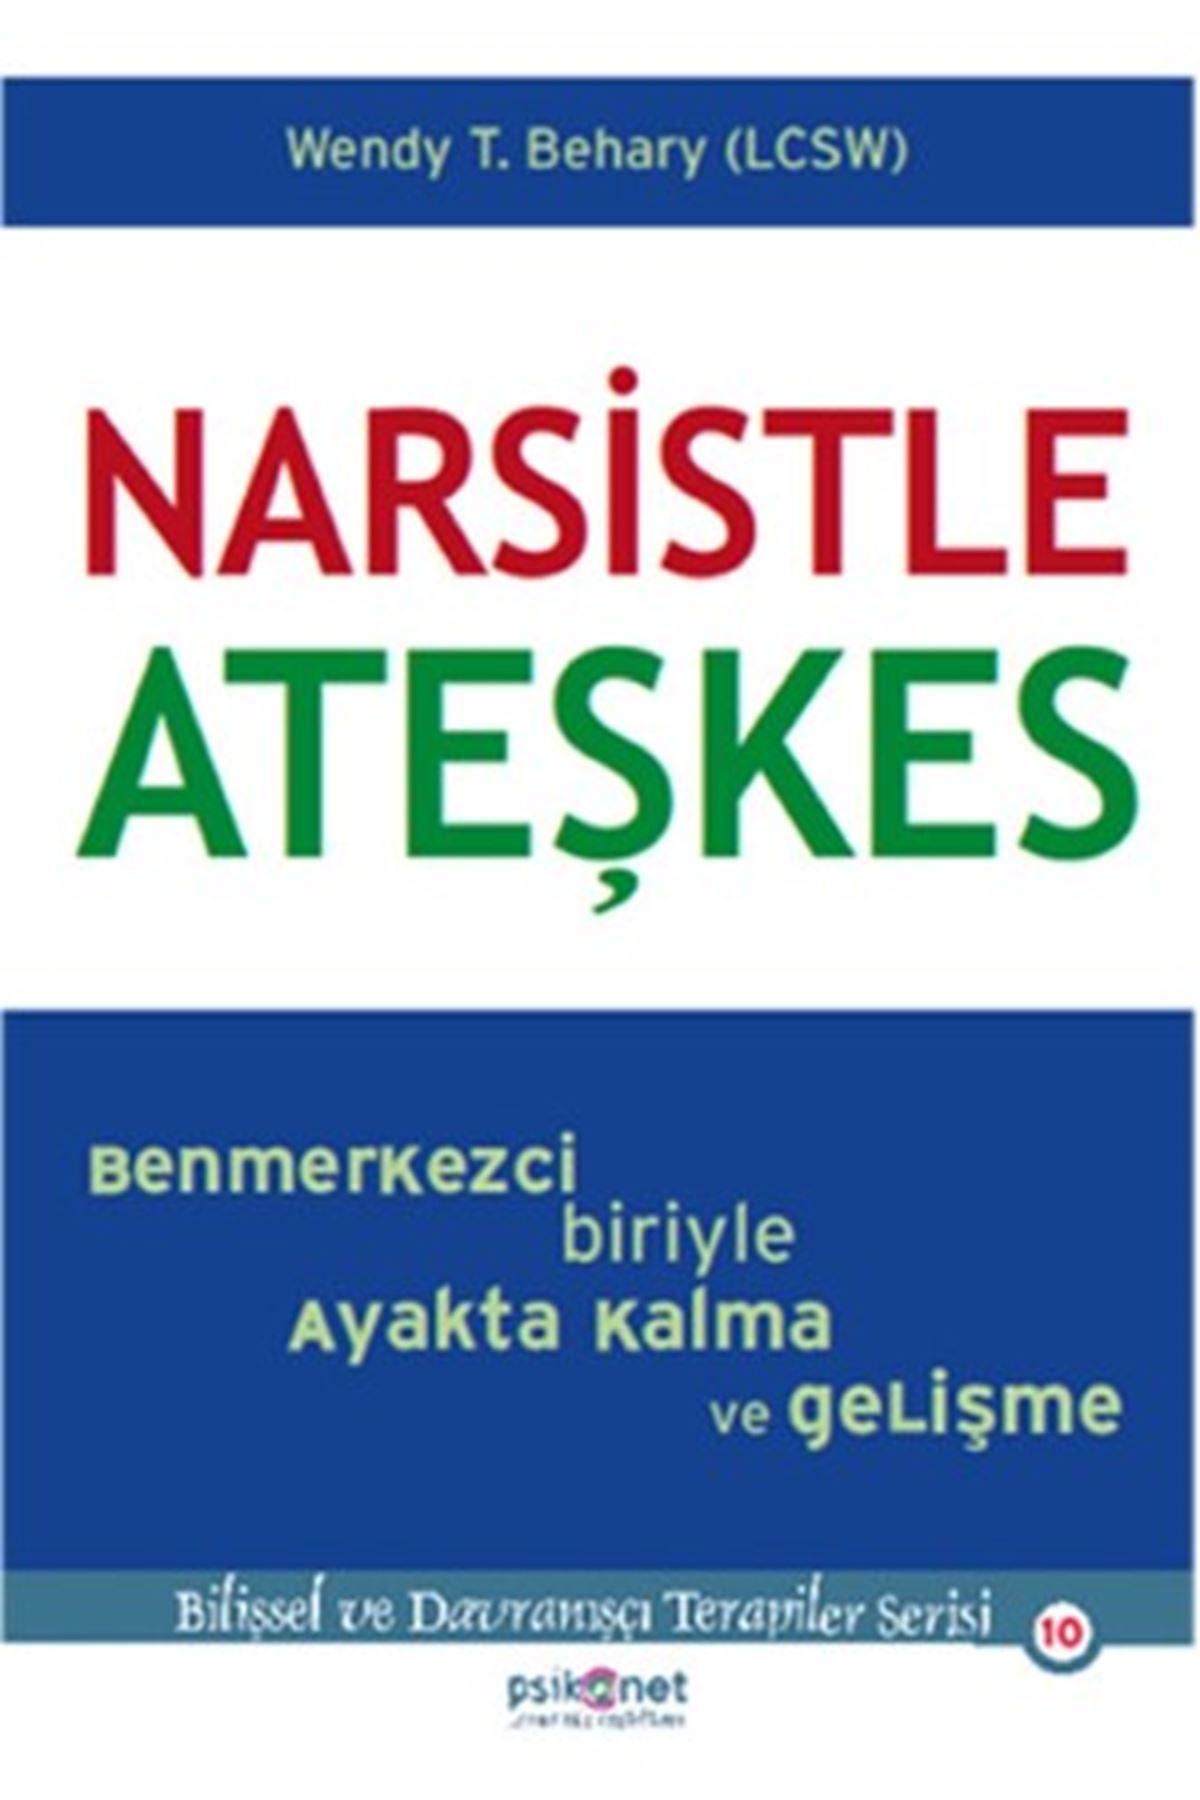 WENDY BEHARY - NARSİSTLE ATEŞKES